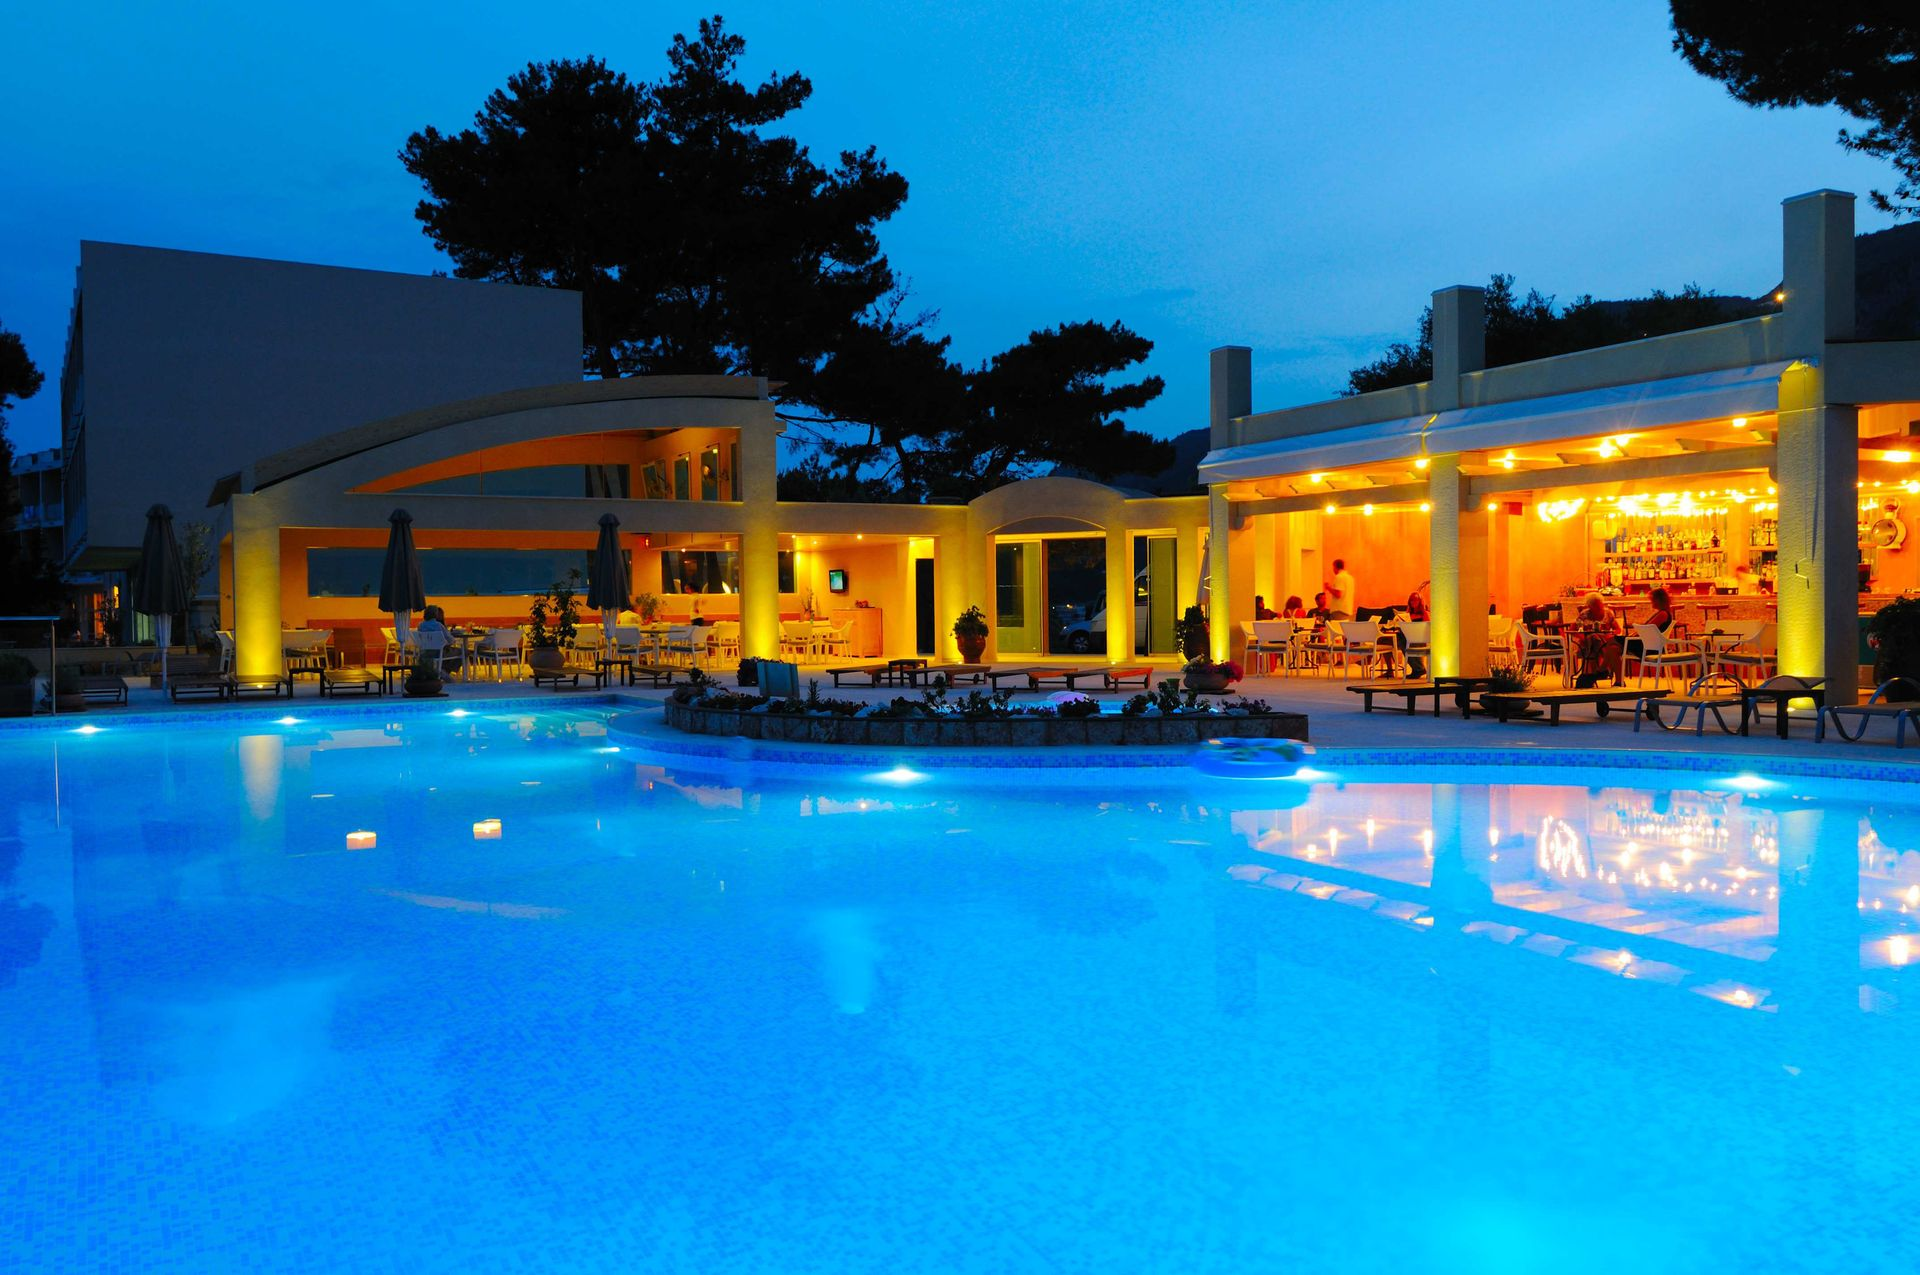 4* Akrotiri Beach Hotel - Κέρκυρα ✦ 8 Ημέρες (7 Διανυκτερεύσεις) ✦ 2 άτομα ✦ Πρωινό ✦ 26/08/2020 έως 30/09/2020 ✦ Μπροστά στην Παραλία!